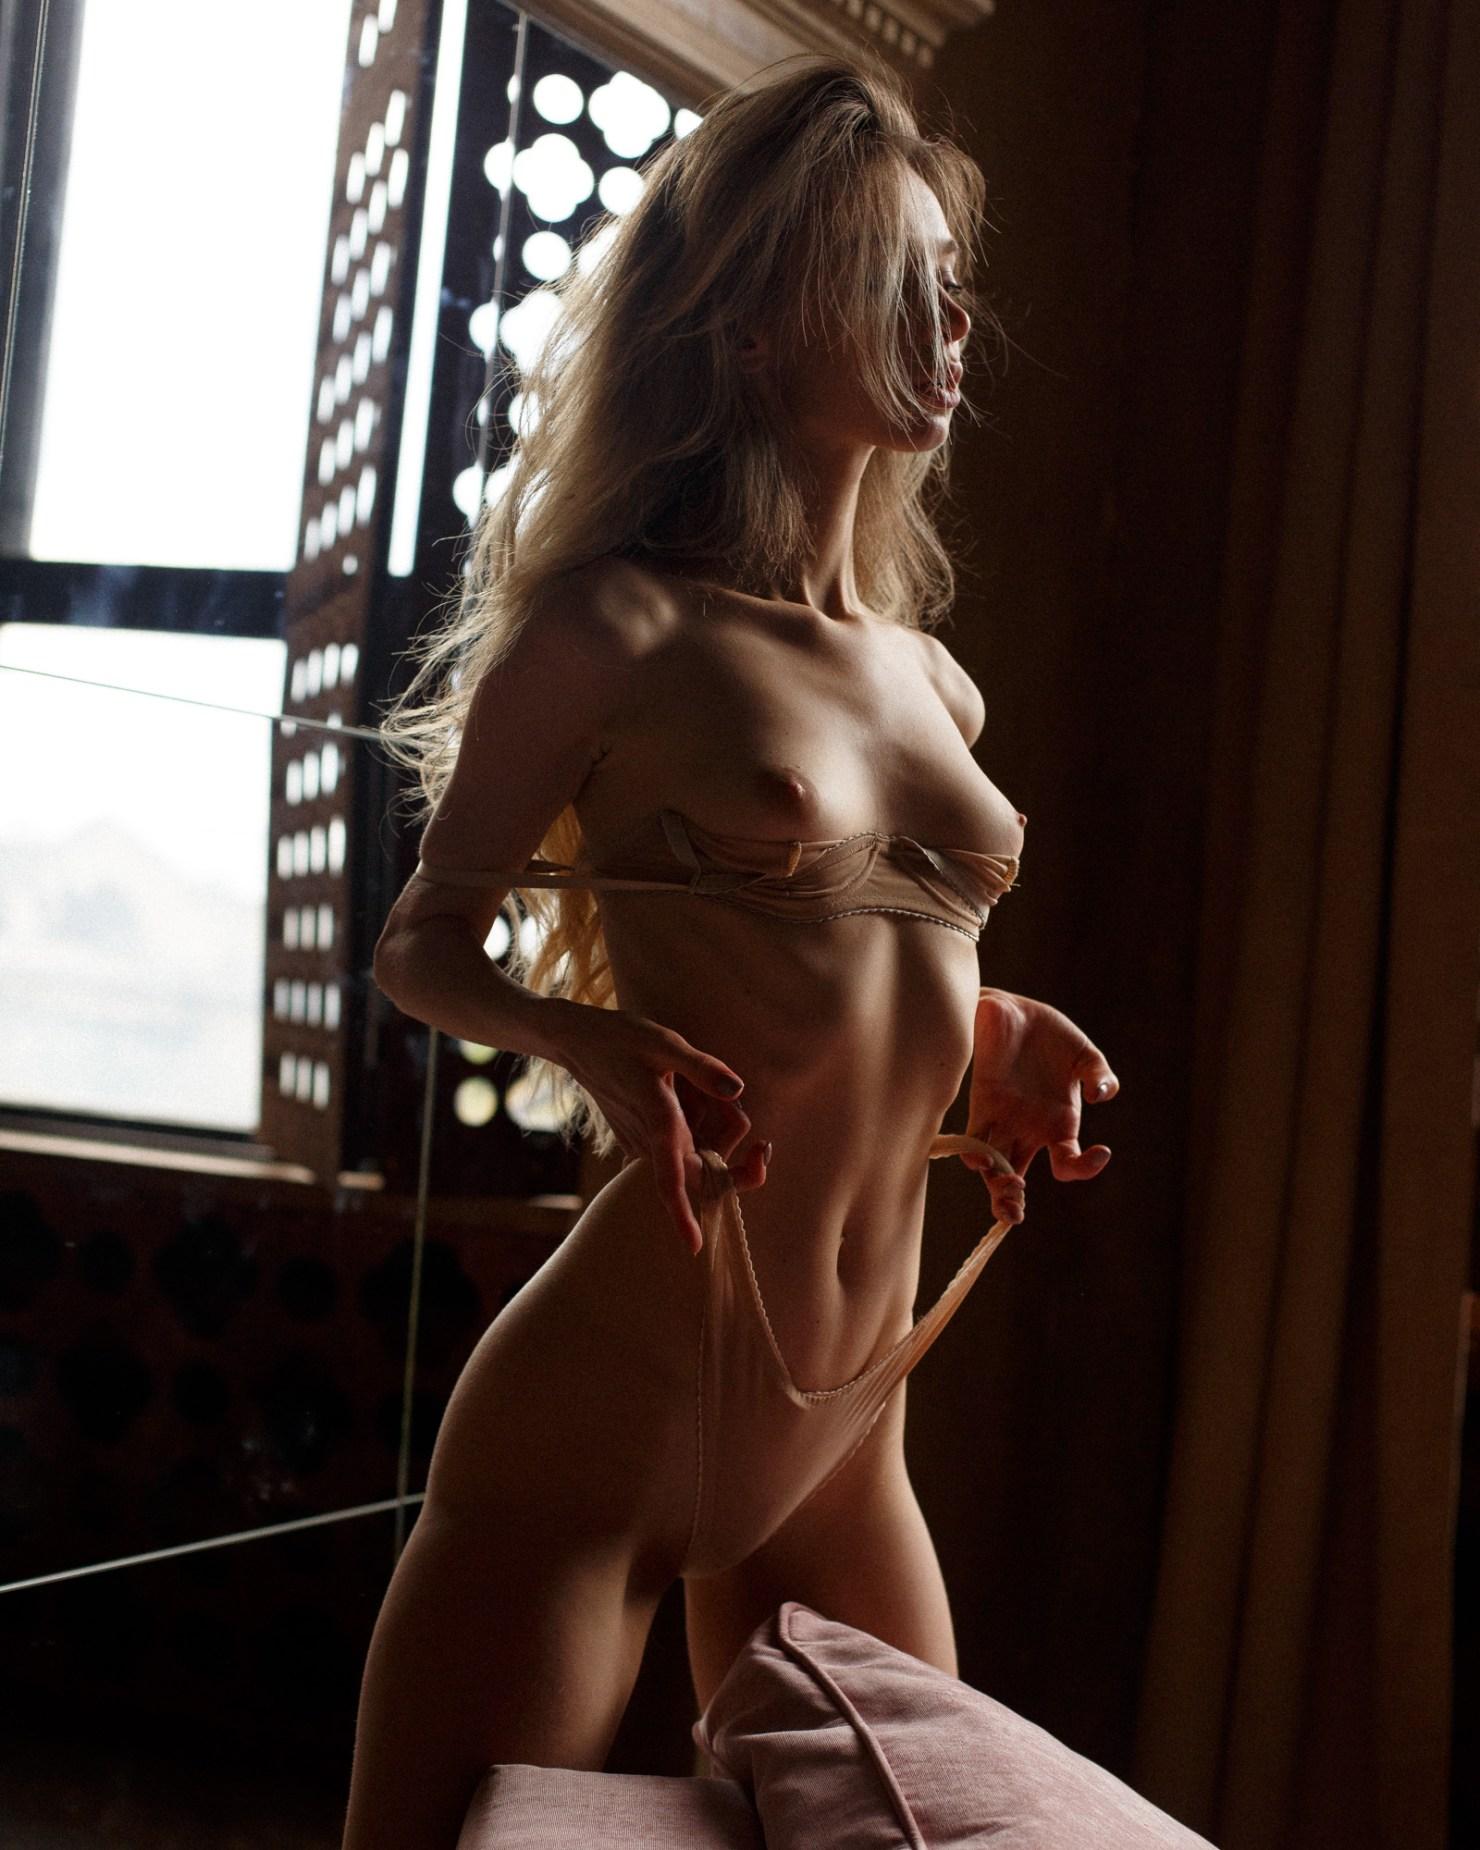 Ana Walczak Nude anna tsaralunga - portraits of girls